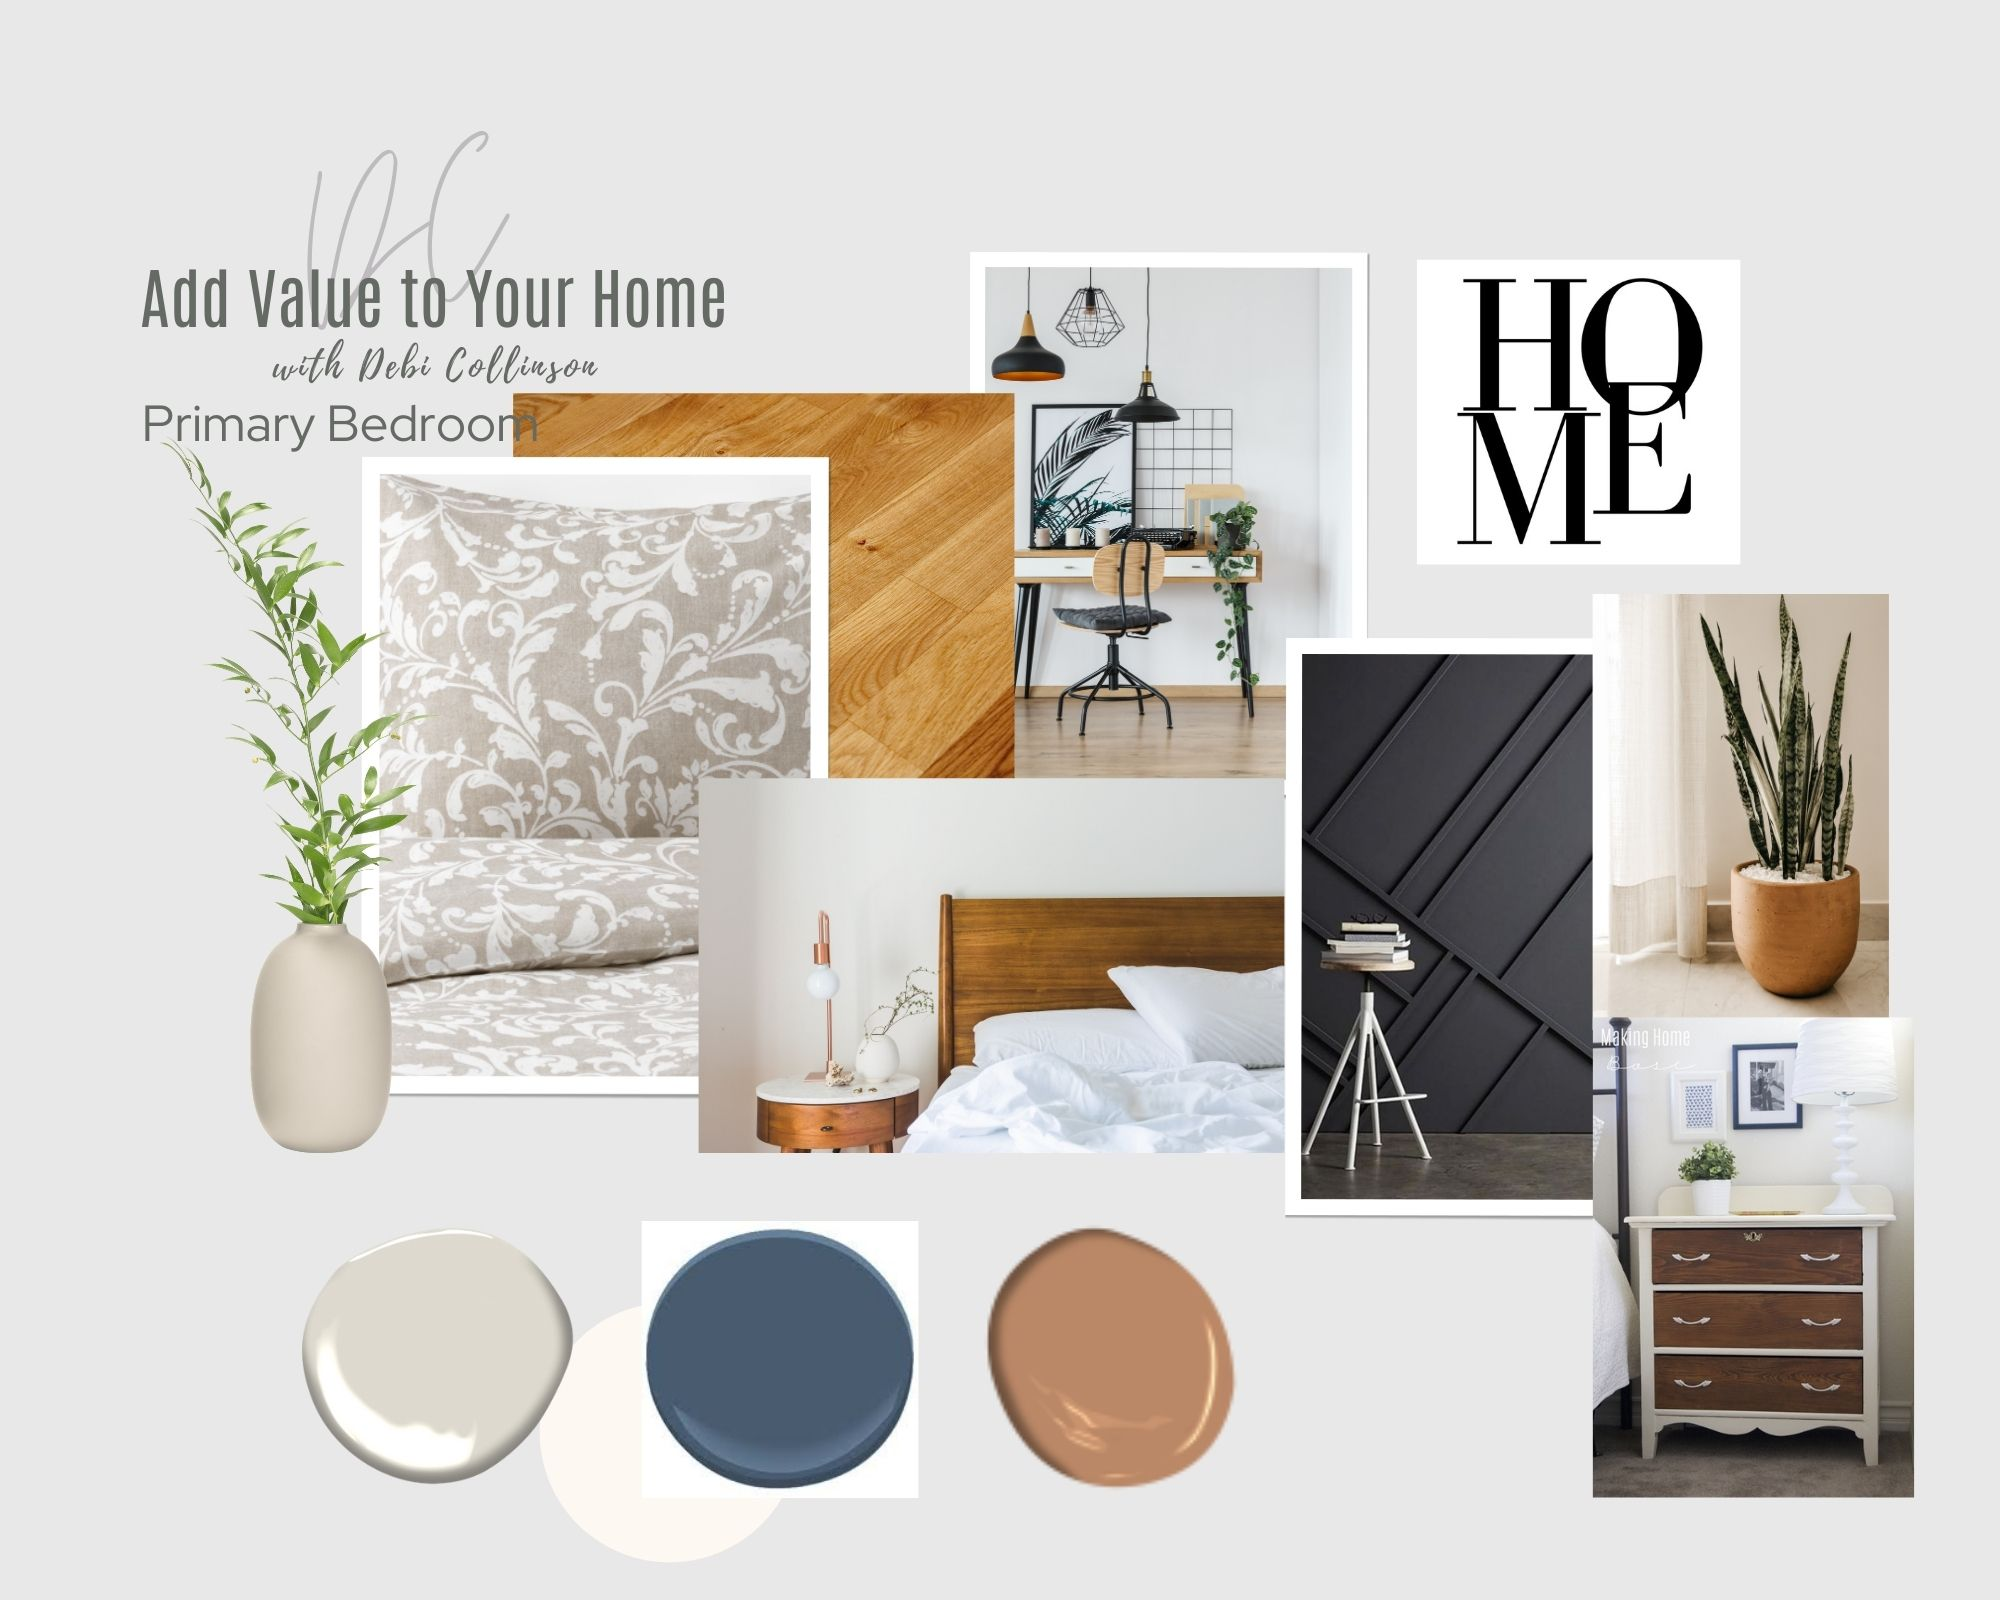 importance-of-design-board-interior-design-add-value-to-your-home